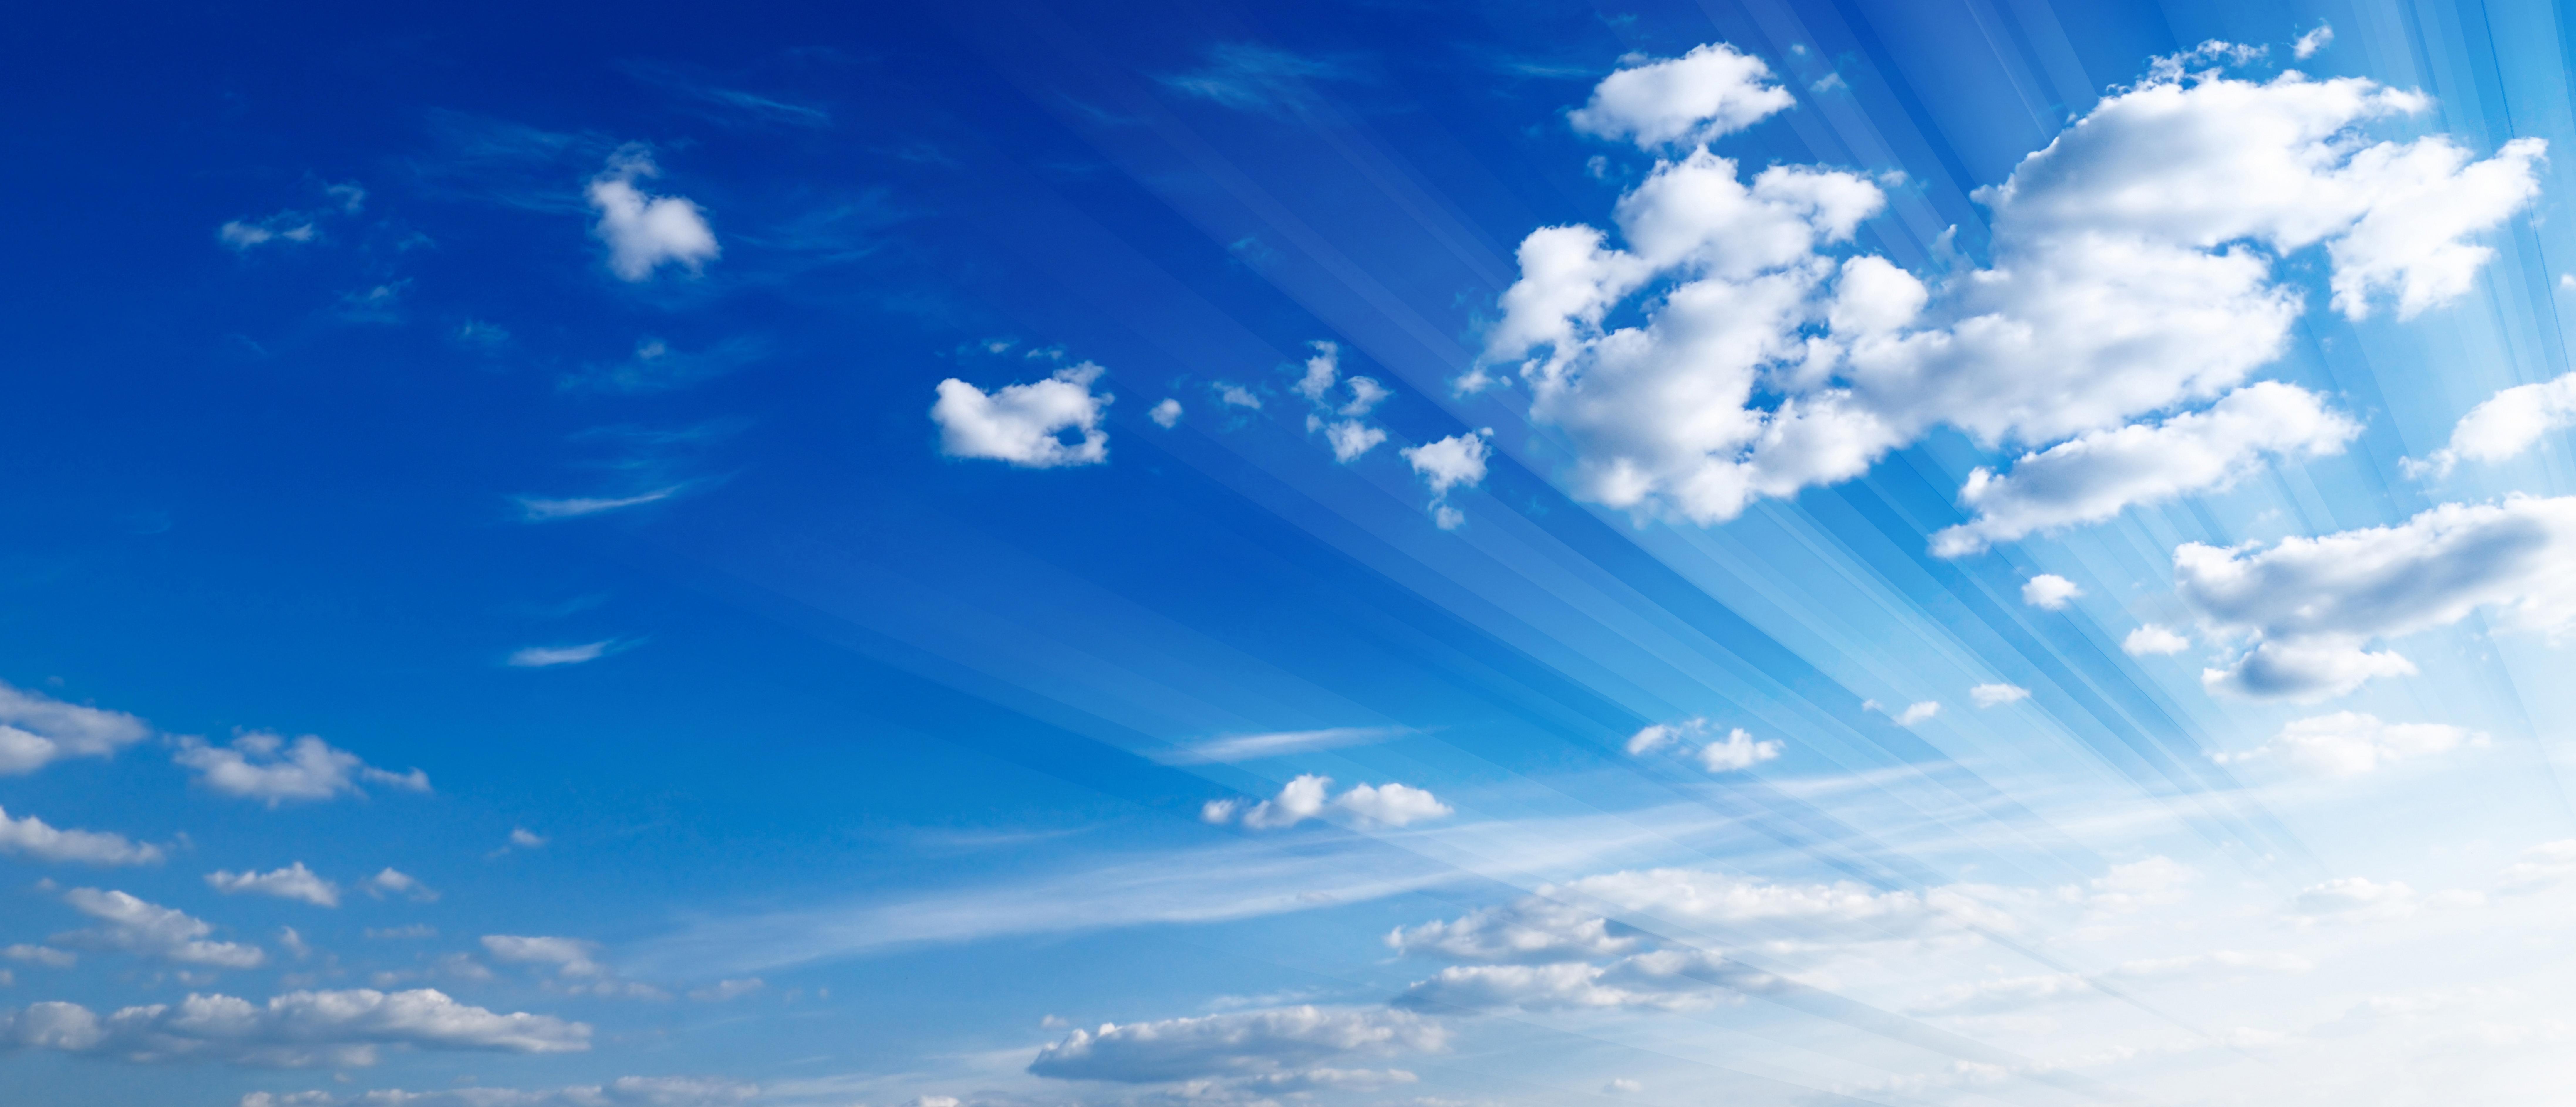 File:Clouds (5).jpg - Wikimedia Commons